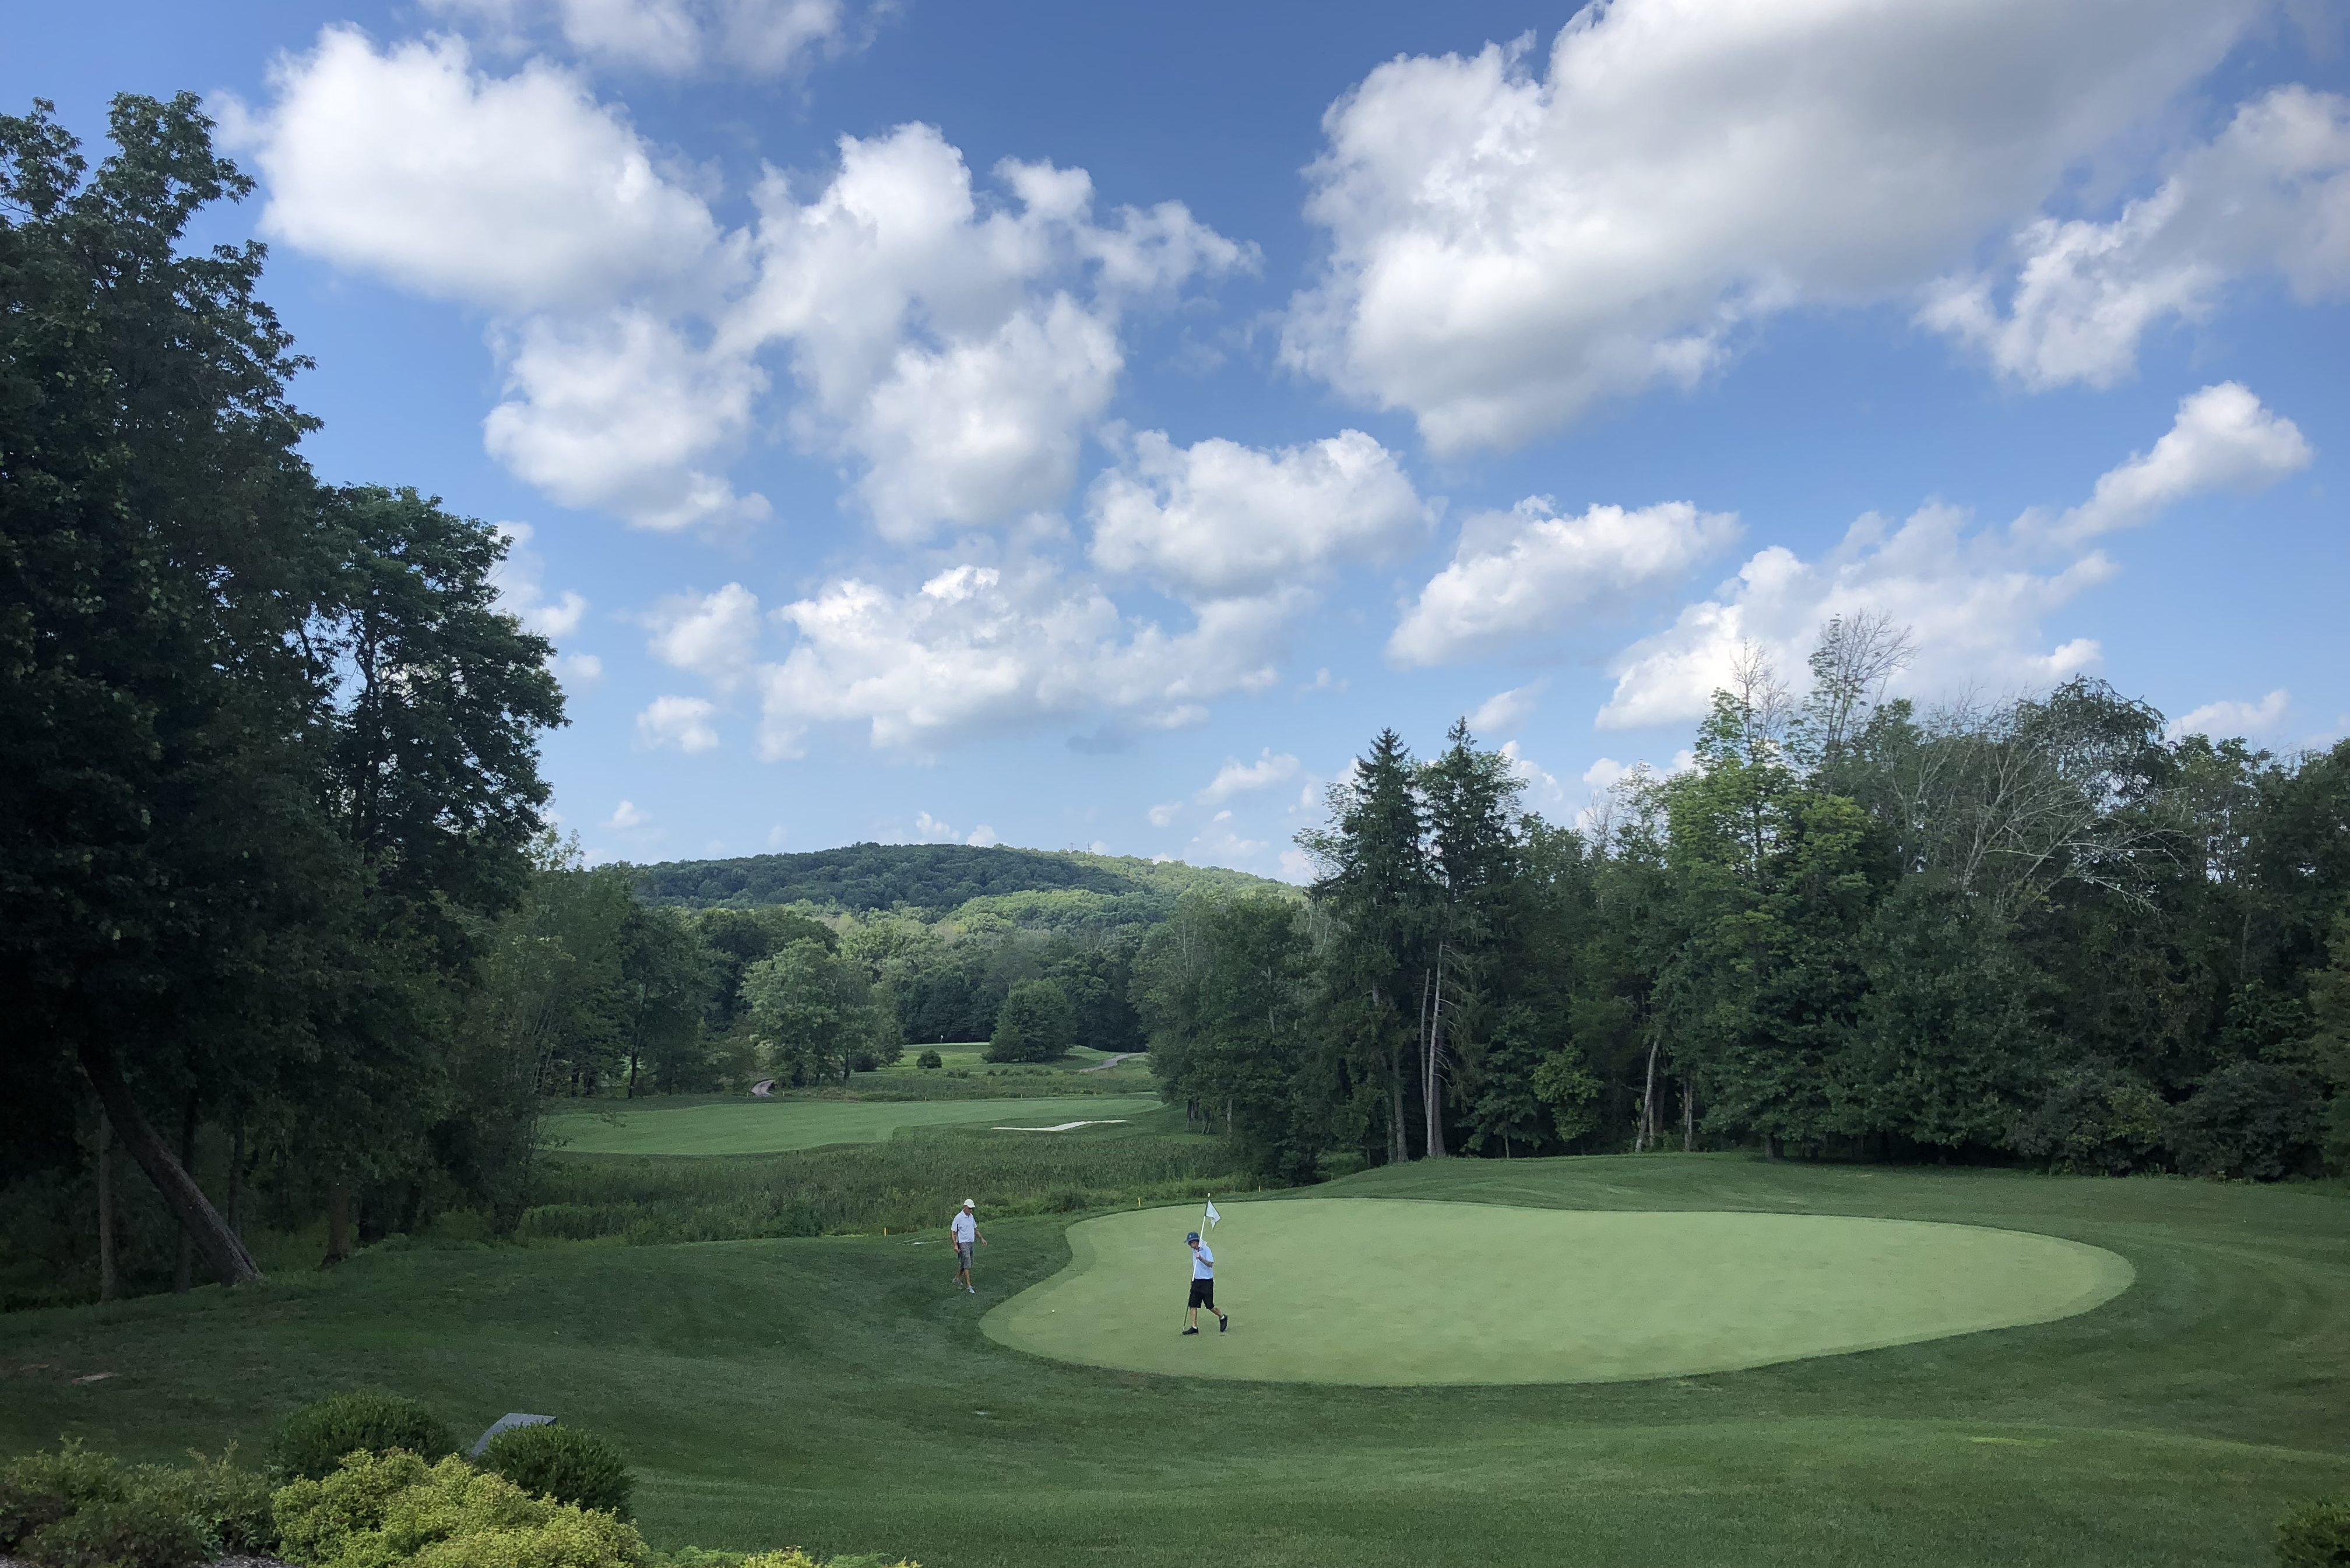 Players at the Lookaway Golf Club in Buckingham.